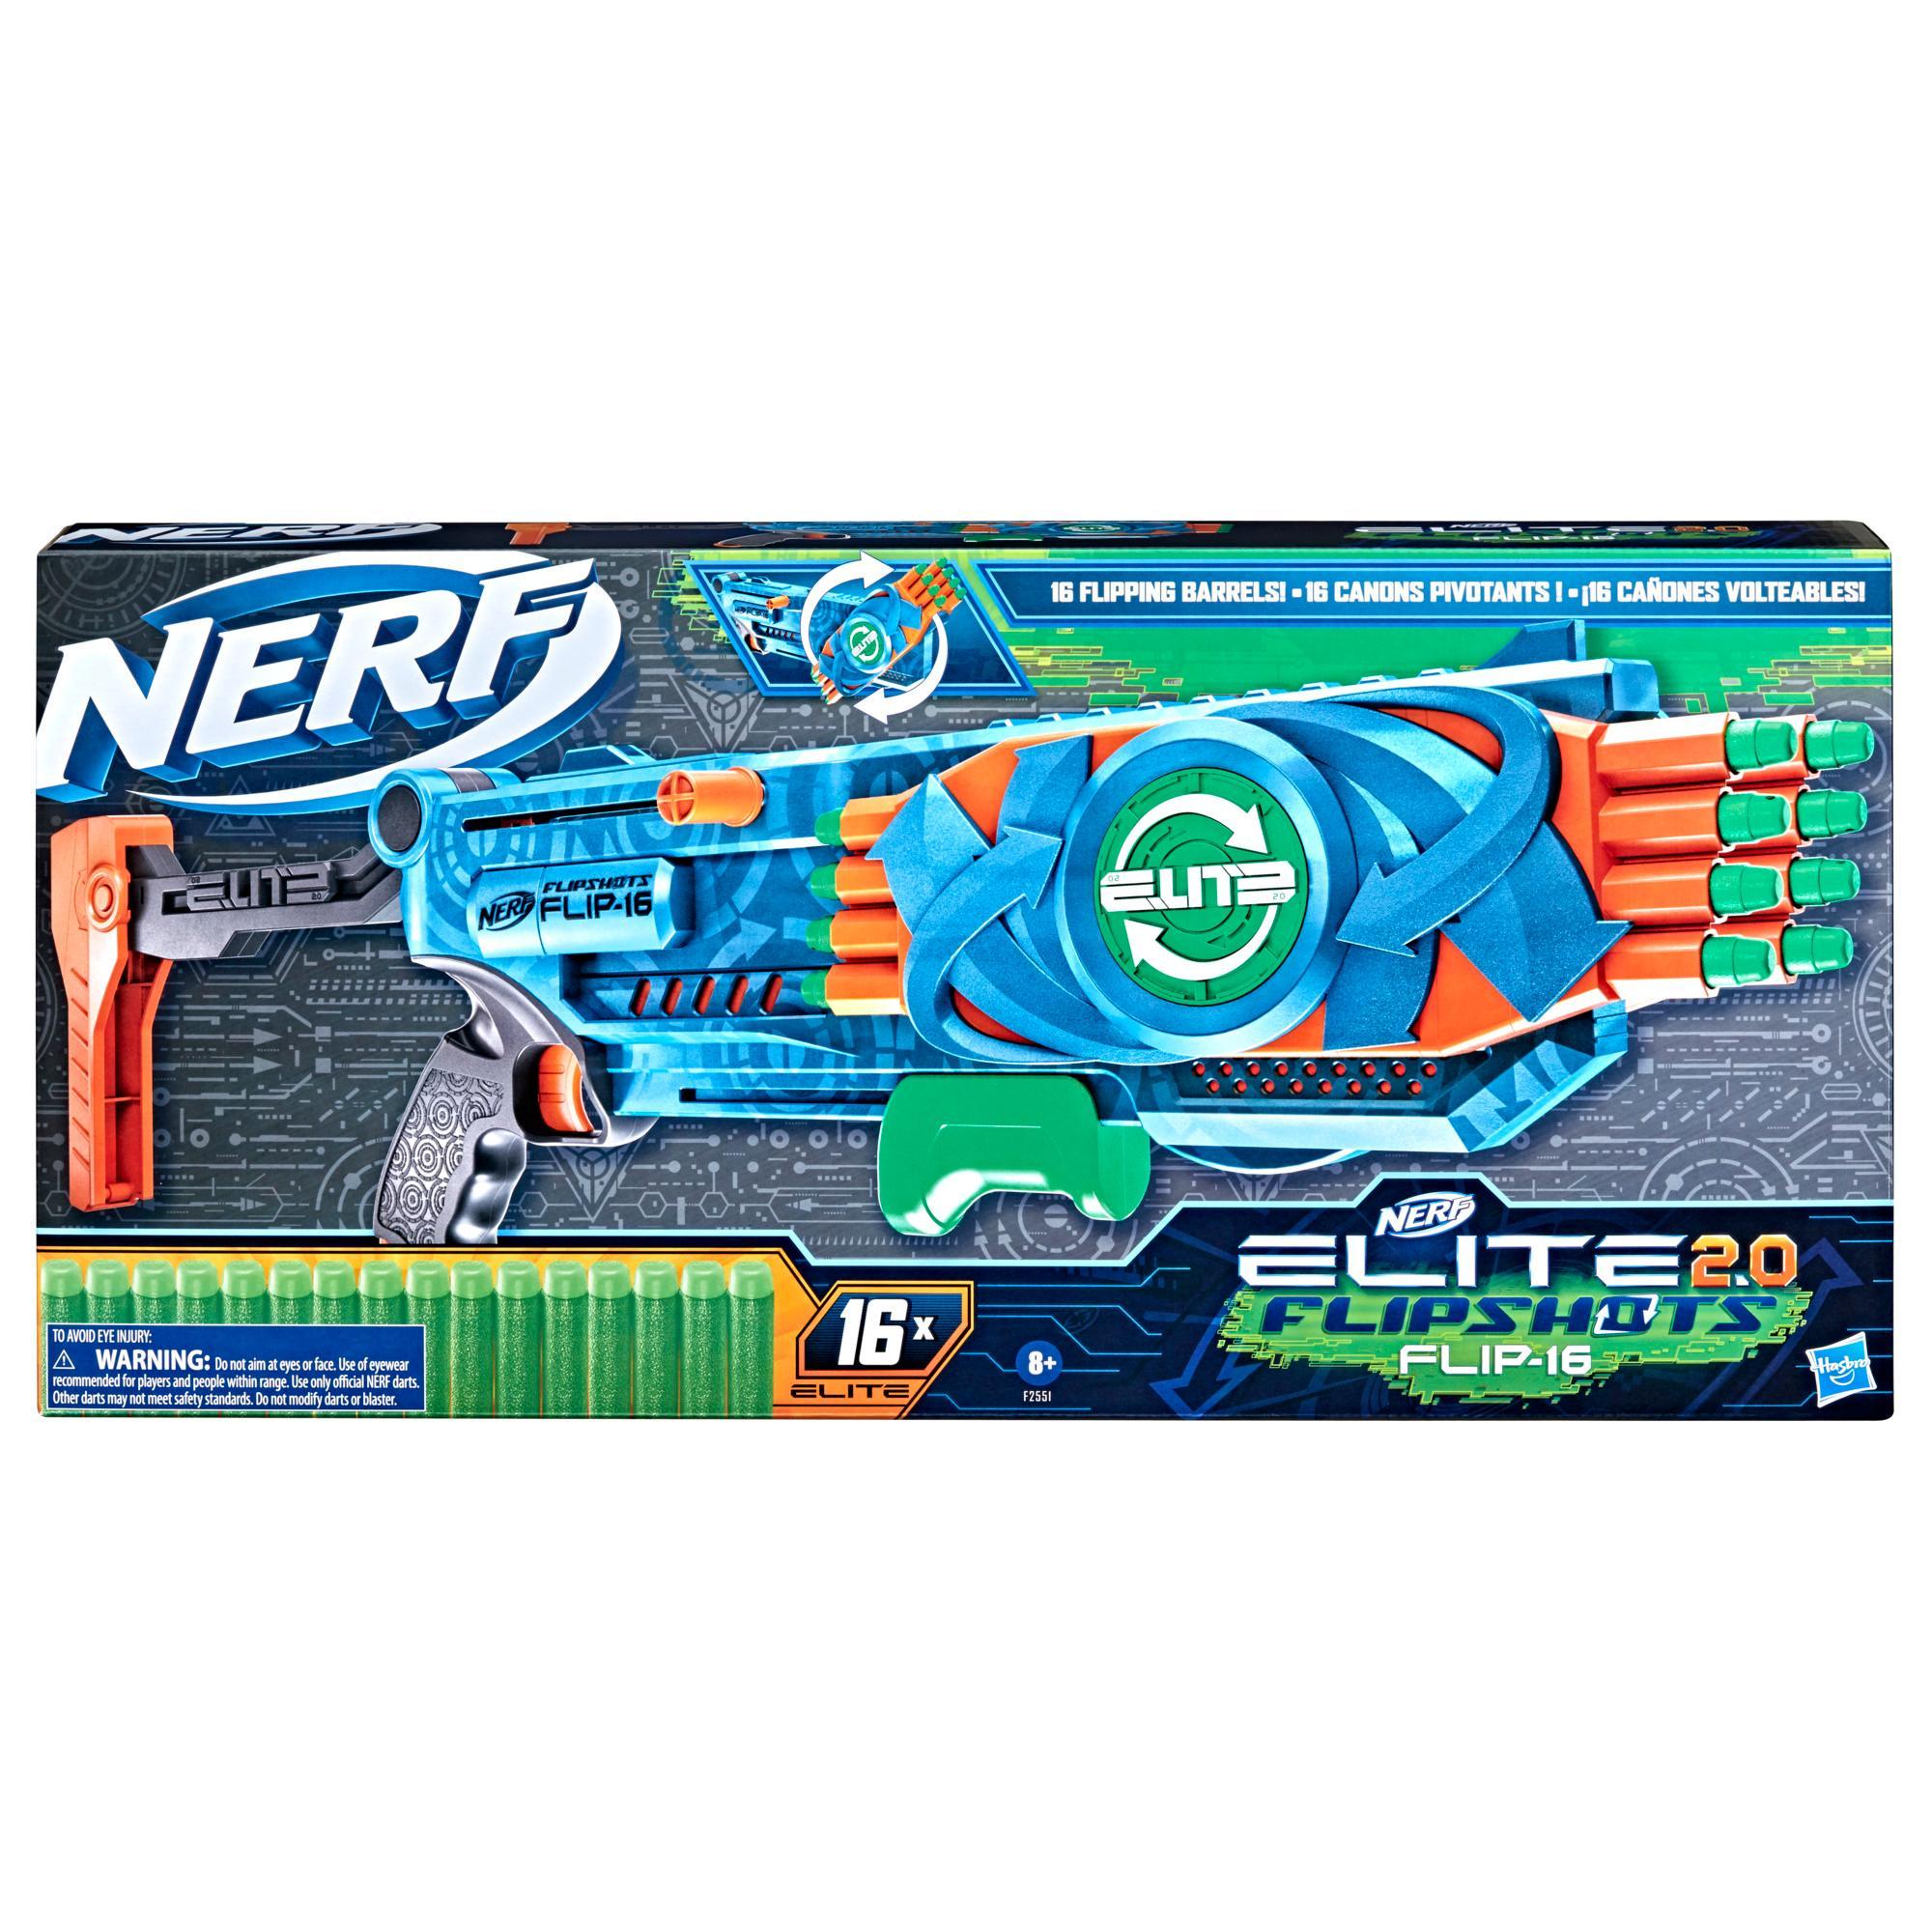 Nerf Elite 2.0 Flipshots Flip-16 Blaster, 16 Dart Barrels Flip to Double Your Firepower, 16-Dart Capacity, 16 Nerf Darts